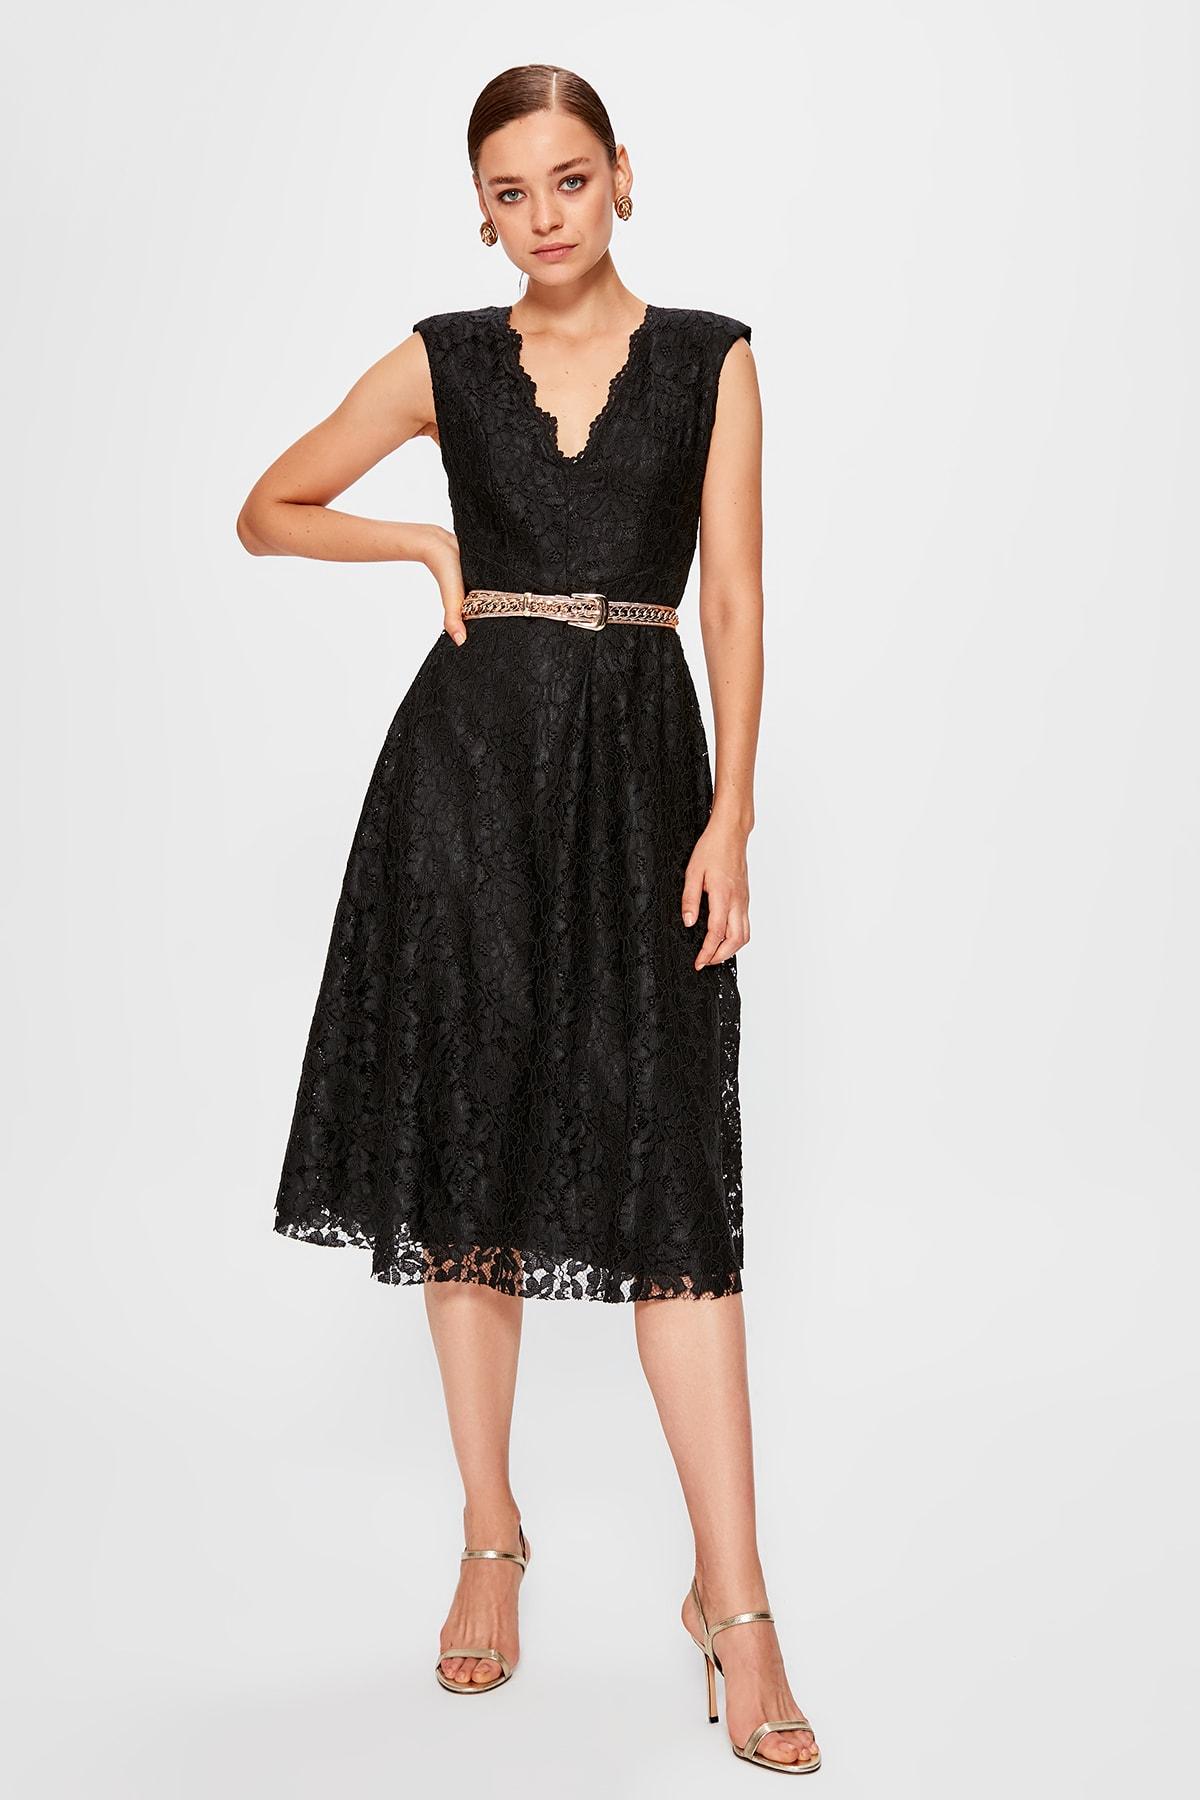 Trendyol Filet Lace Dress TPRAW20EL0535 Dresses    - AliExpress